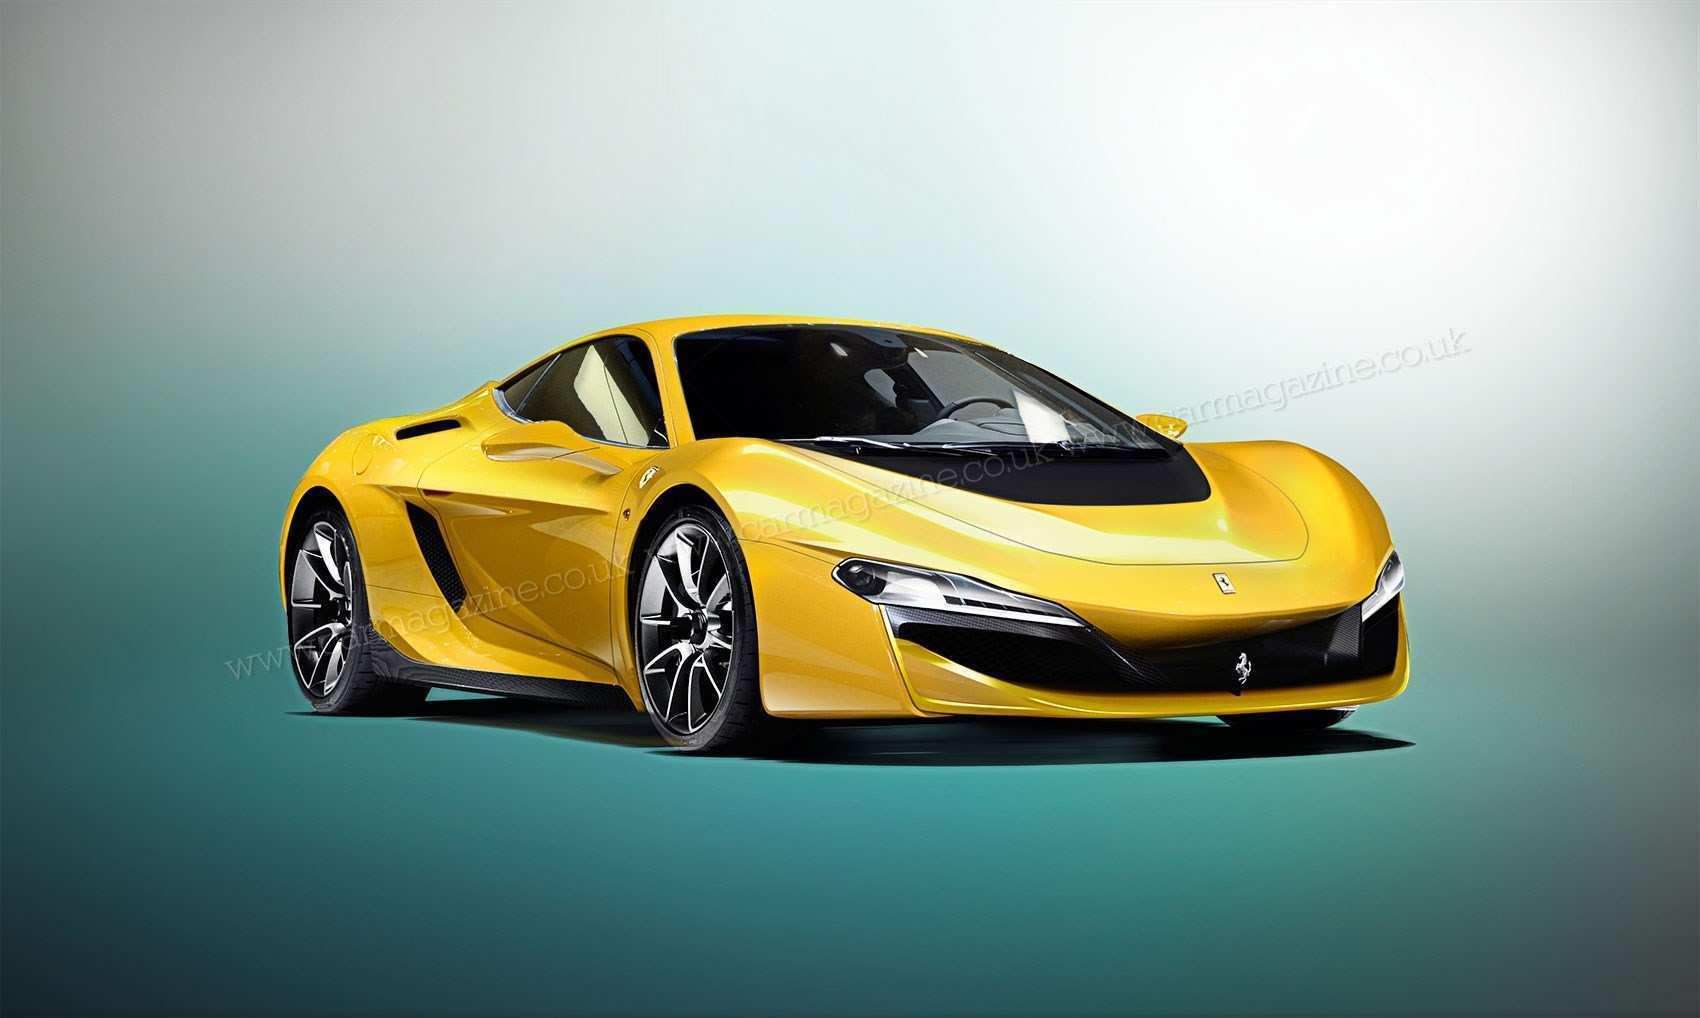 68 New Dino Ferrari 2019 Engine Redesign and Concept with Dino Ferrari 2019 Engine